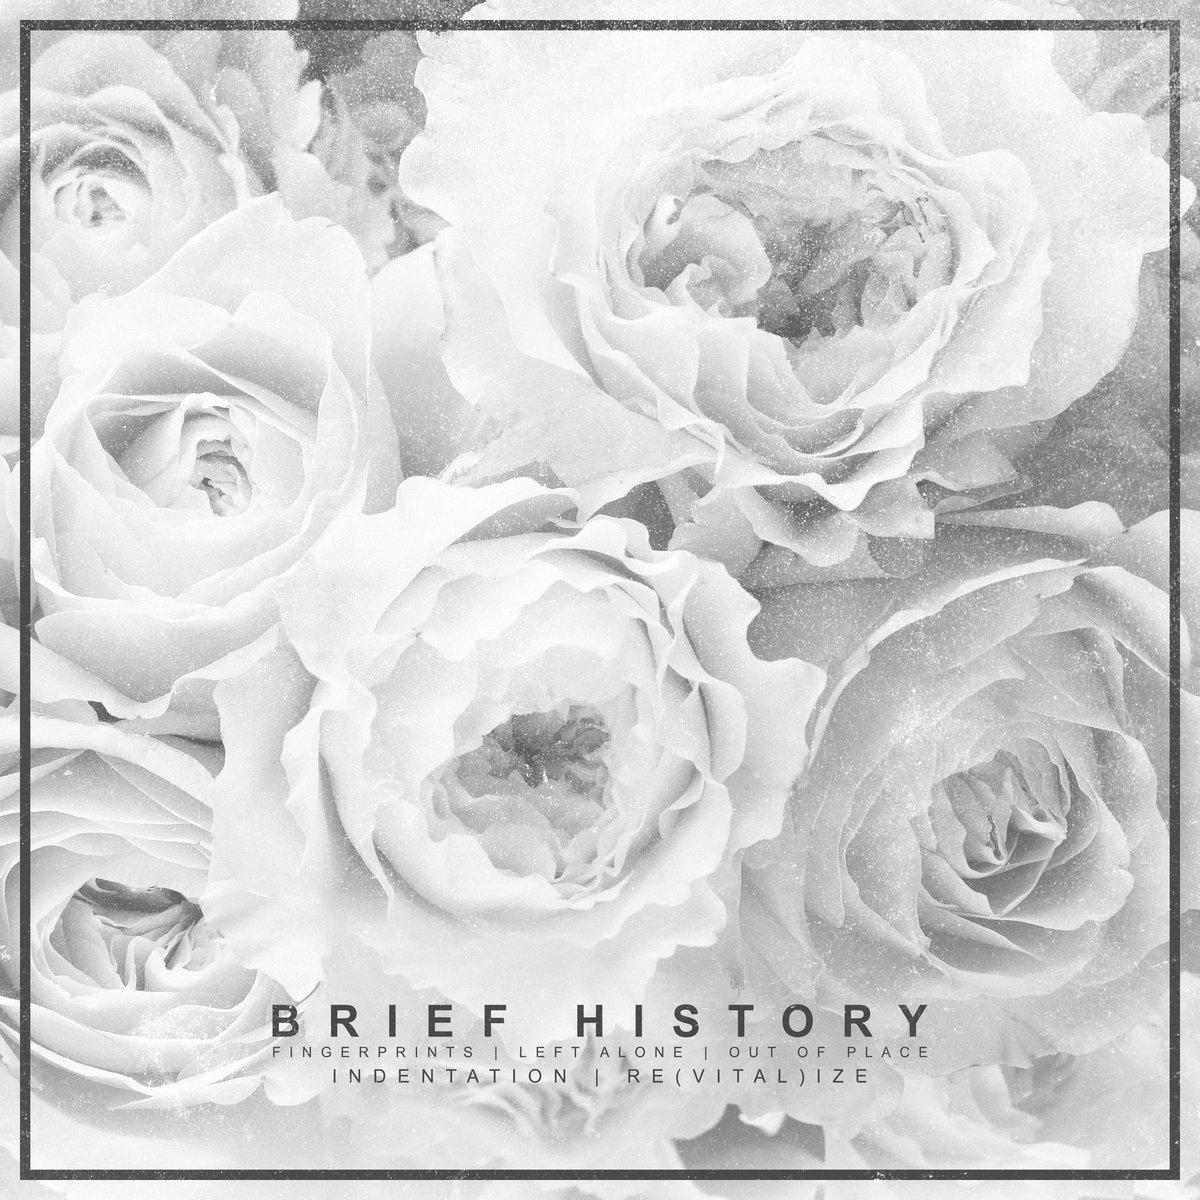 Brief History - Fingerprints [single] (2018)